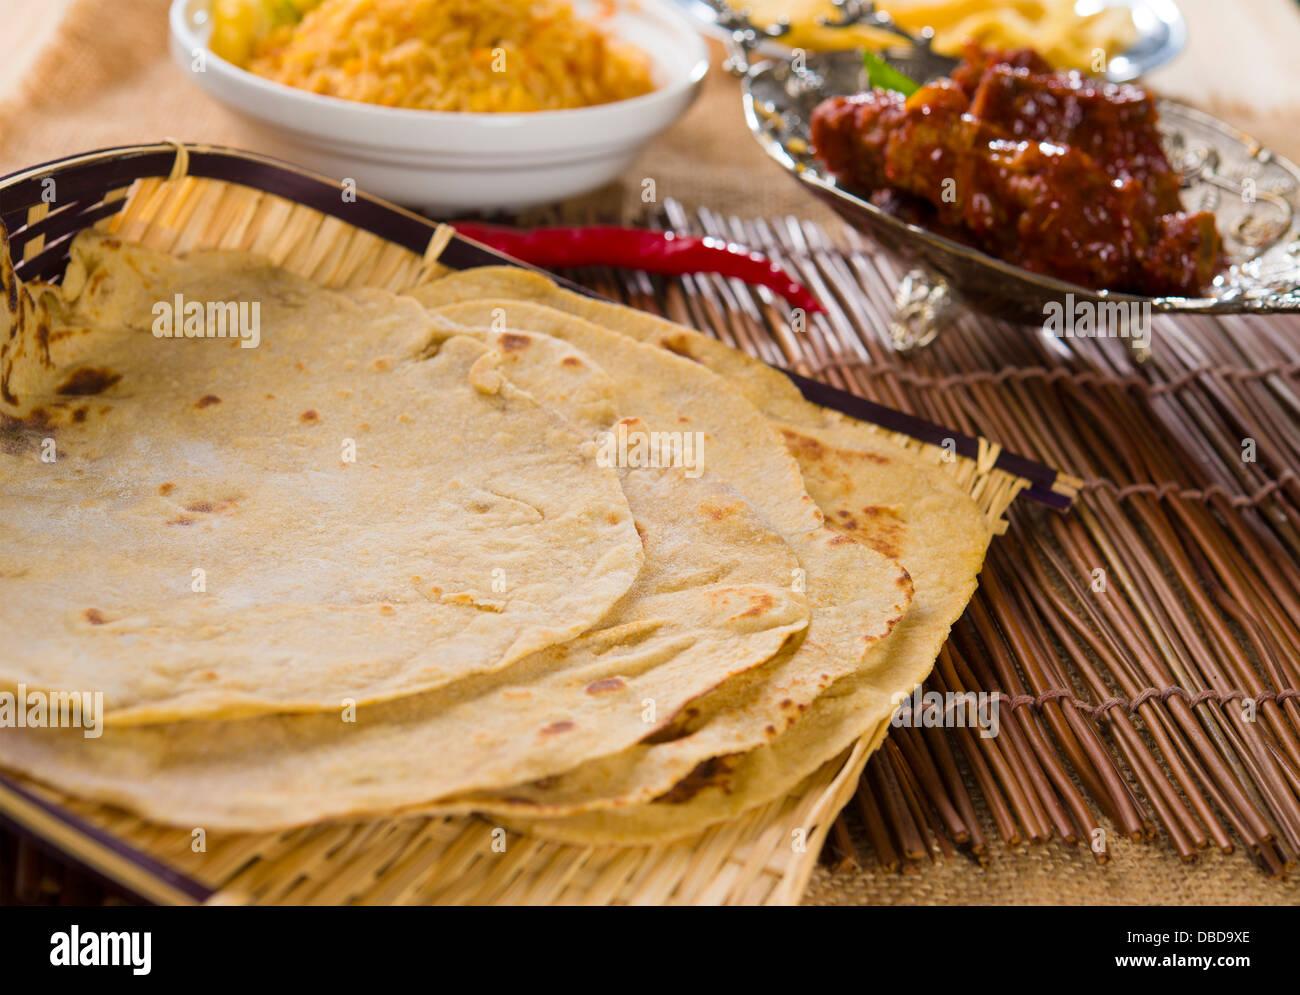 Chapatti roti, curry chicken, biryani rice, salad, masala ...